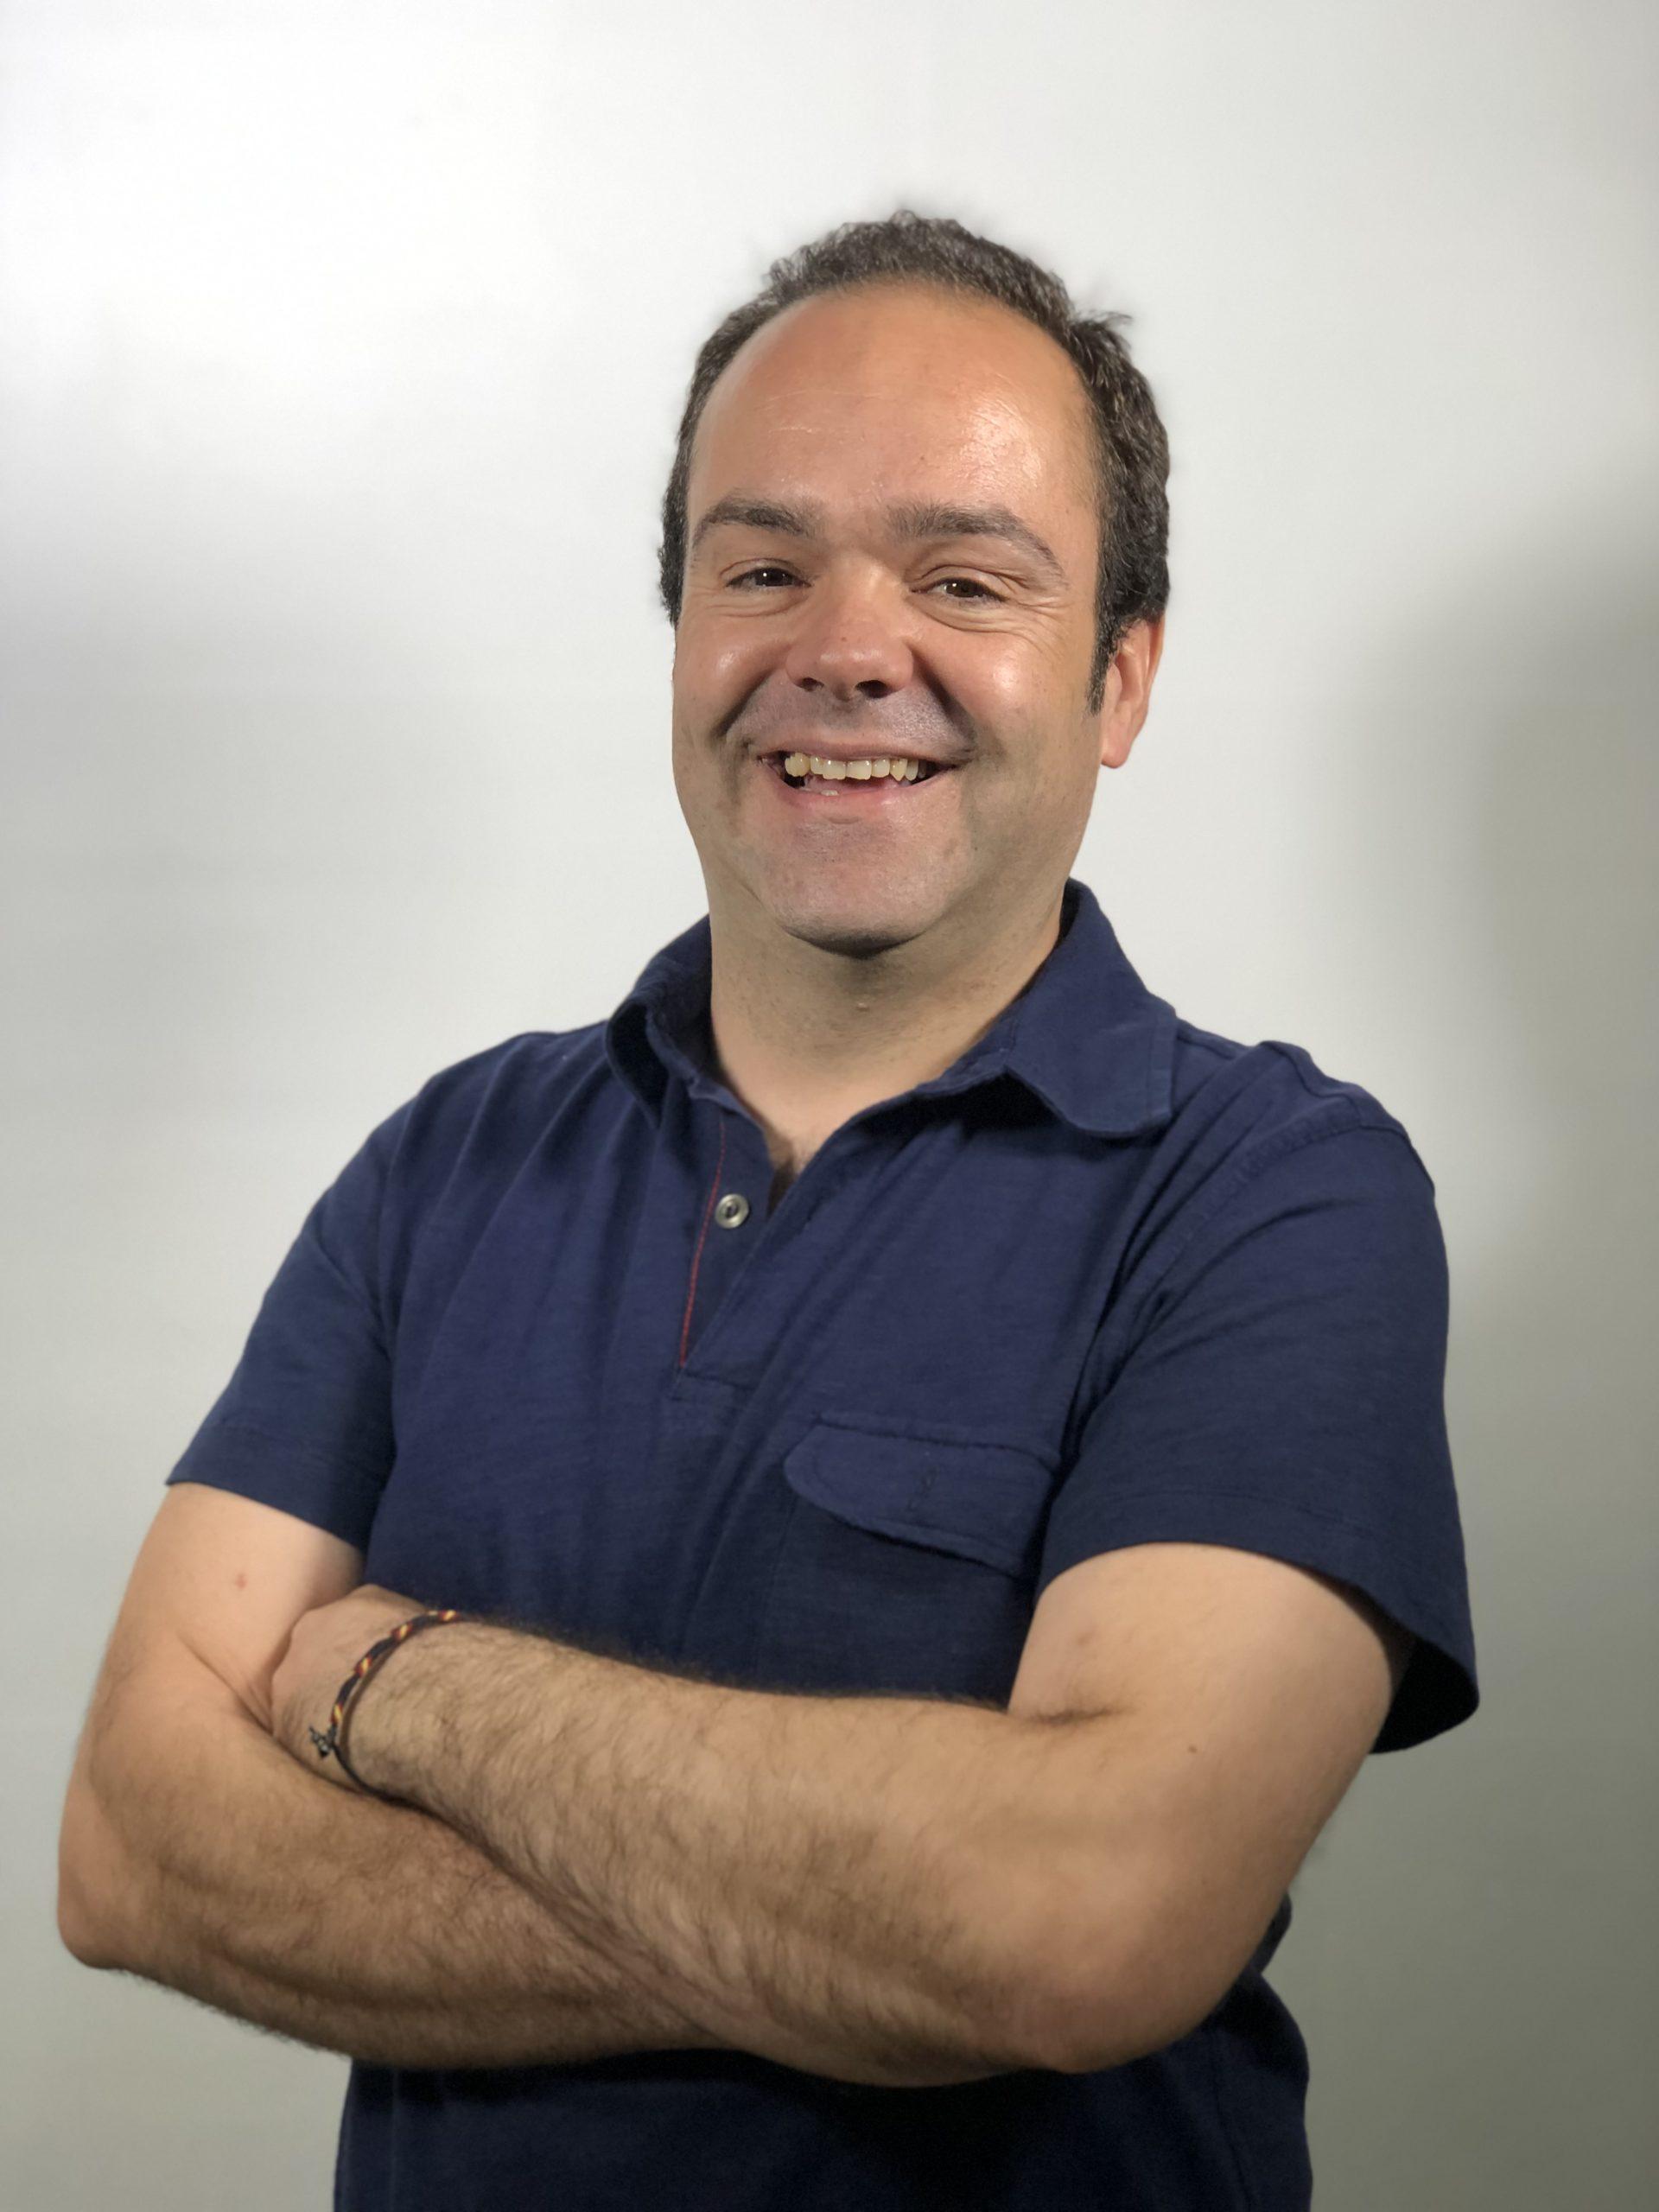 DAVID FERNÁNDEZ FRANCO